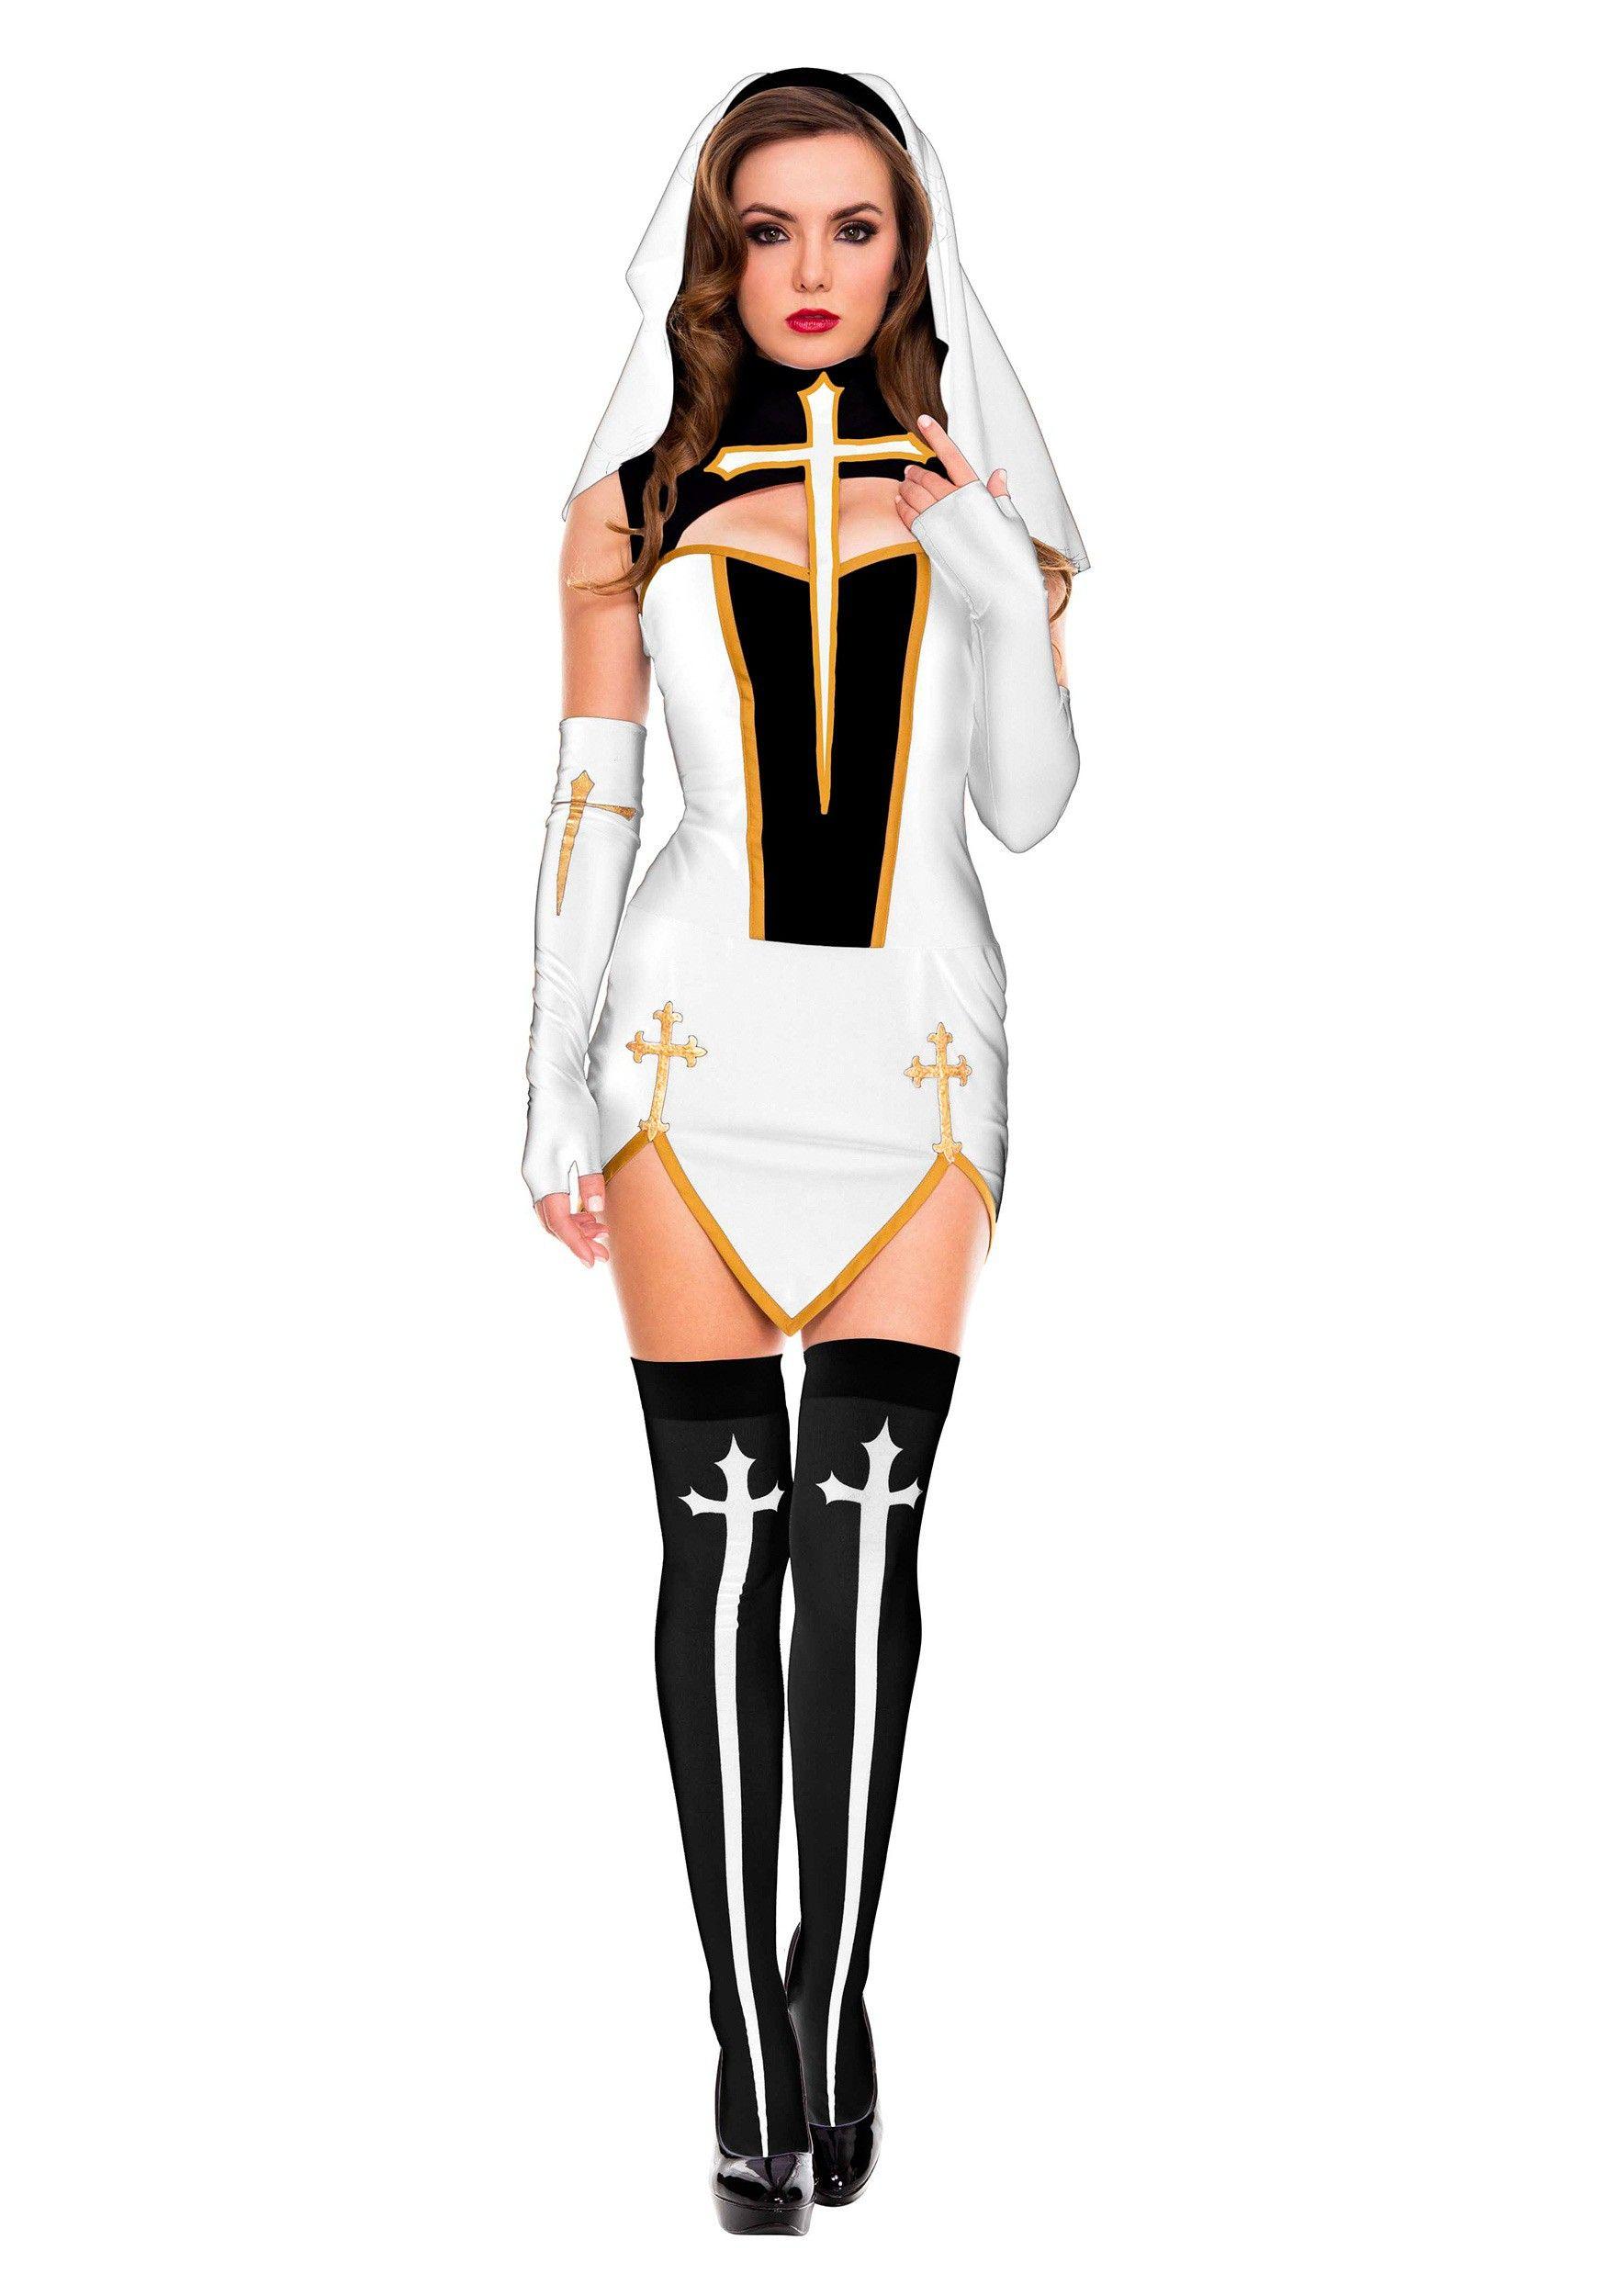 Women's White Bad Habit Nun Costume   Nun costume, Costumes and ...